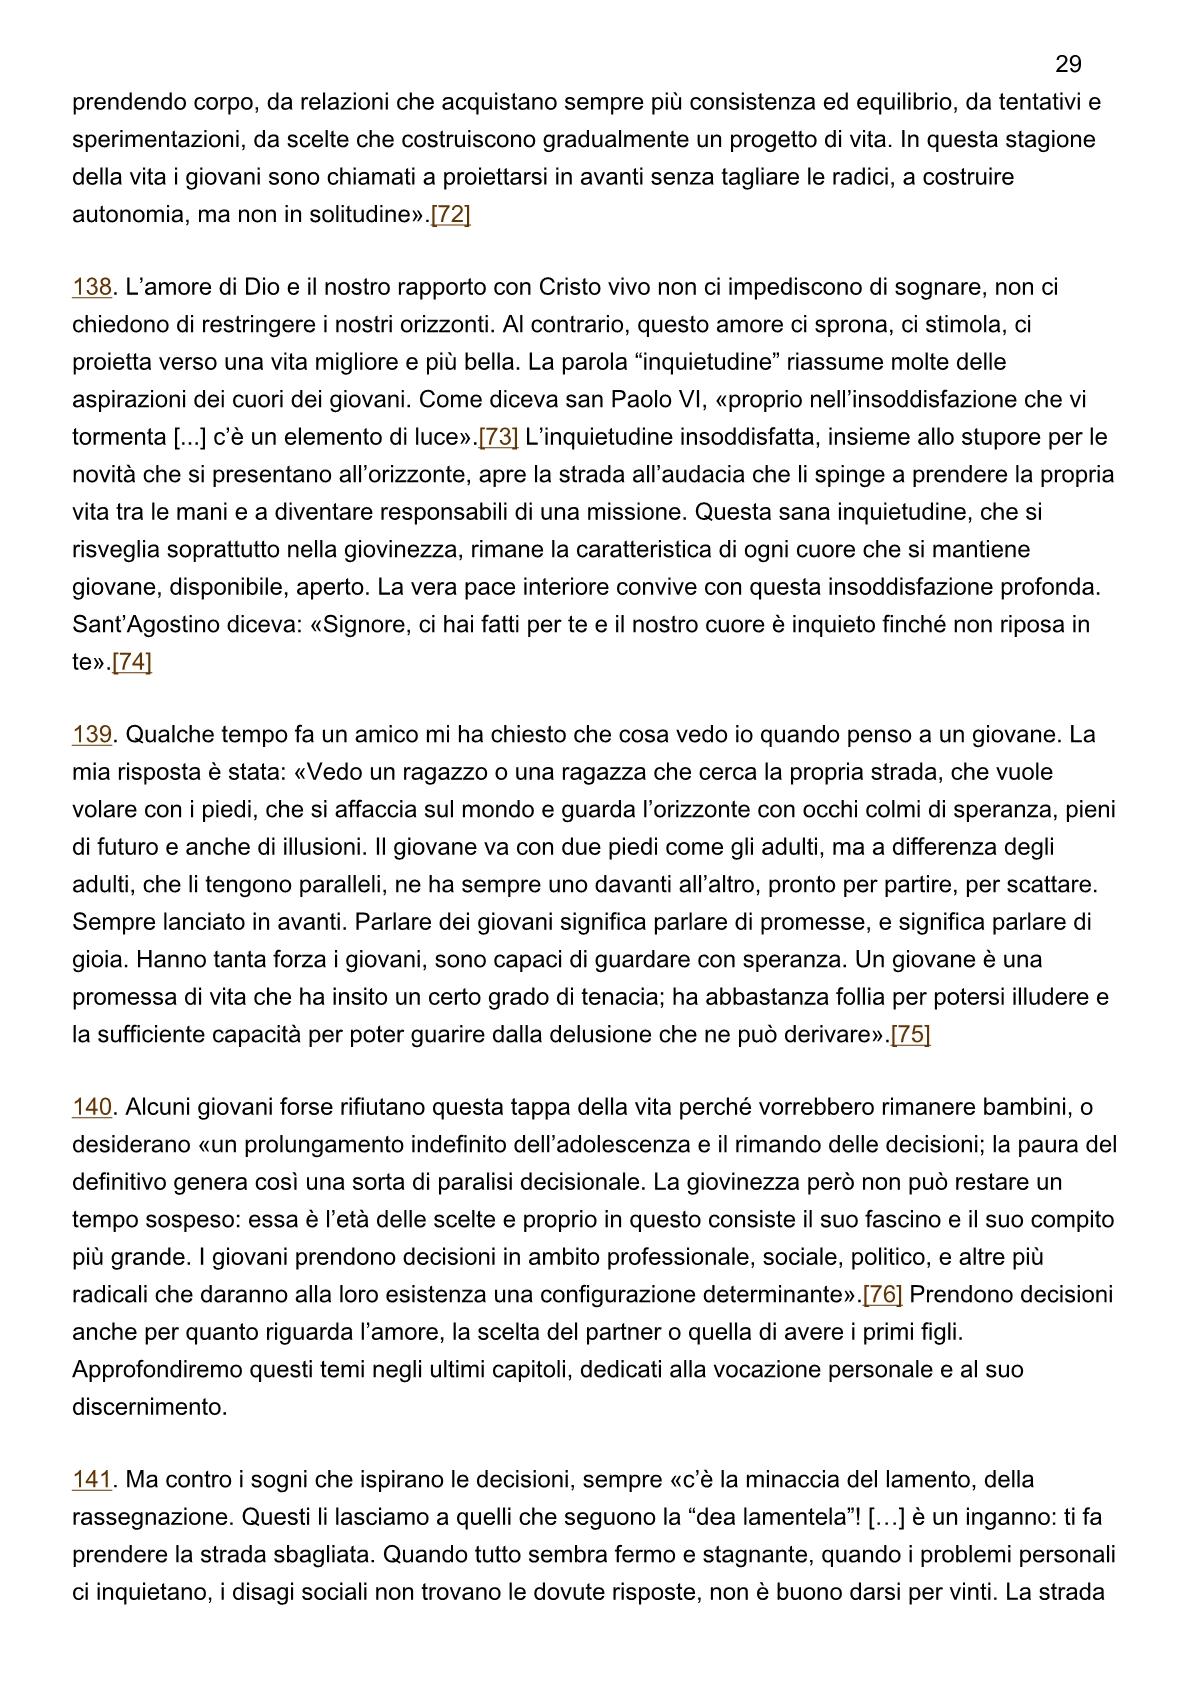 papa-francesco_esortazione-ap_20190325_christus-vivit29